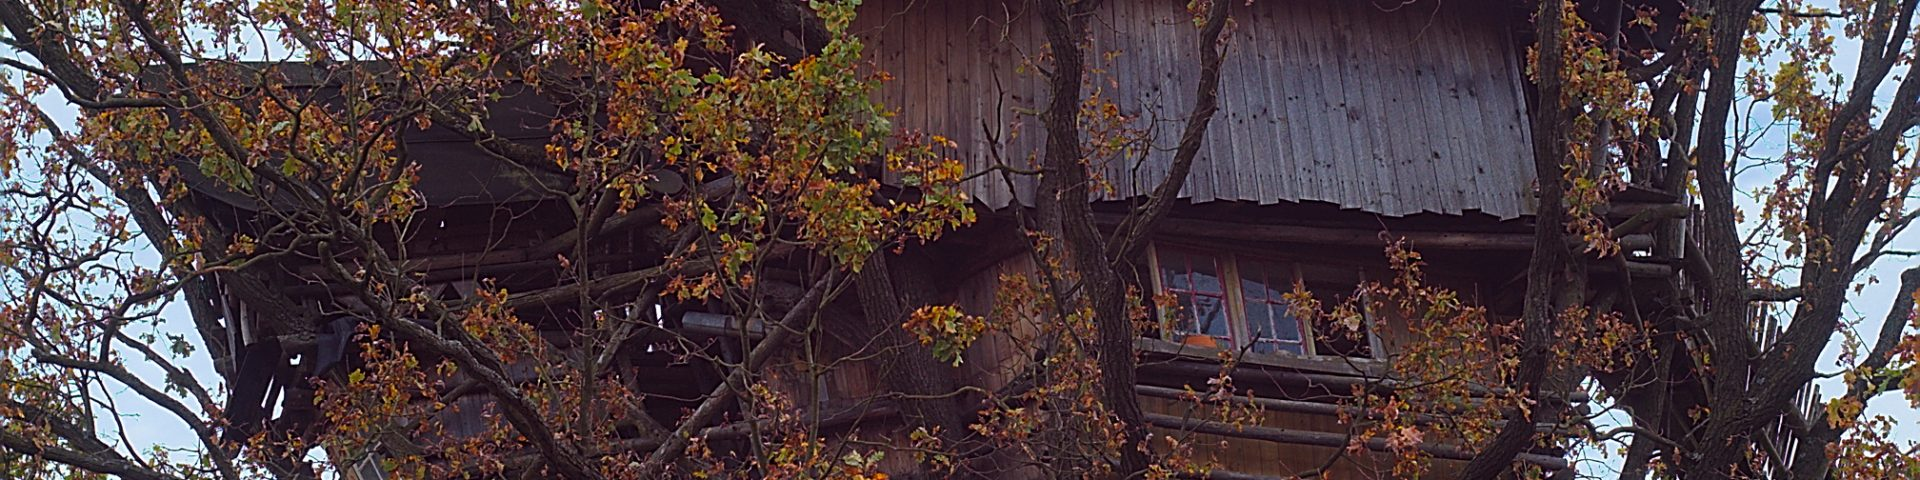 Baumhaus Baumhaushotel